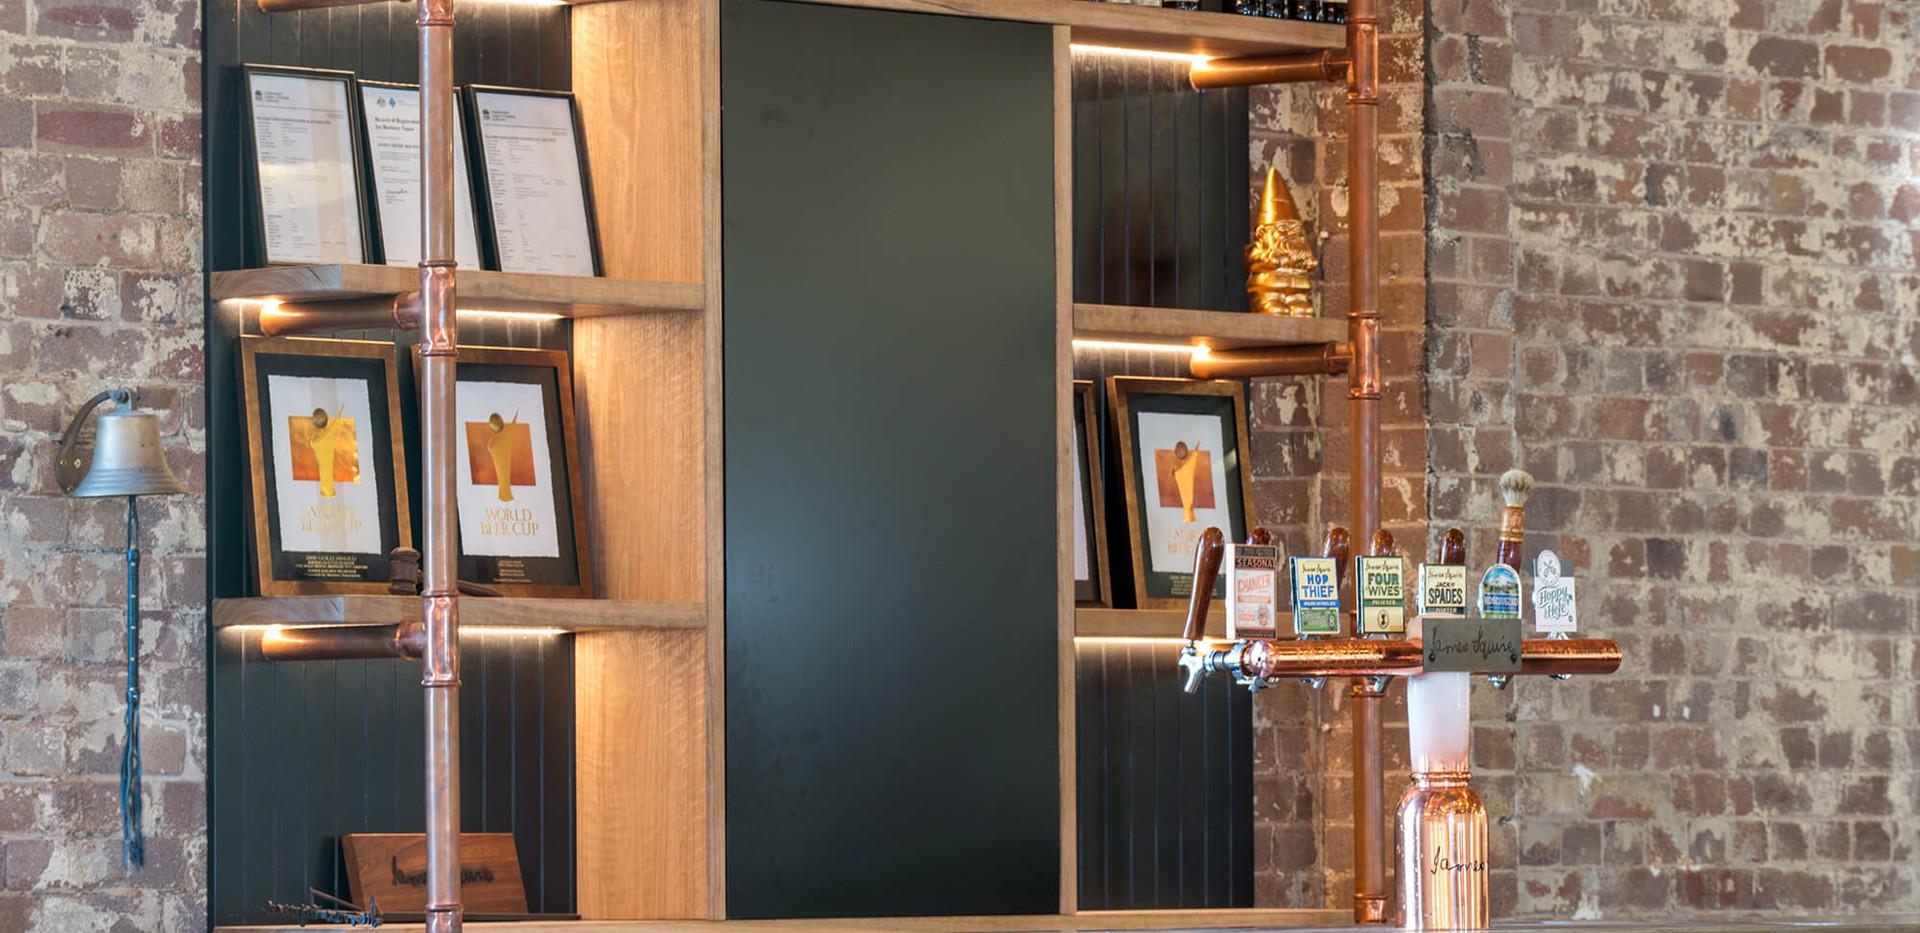 Lion Malt Shovel Bar - bar layout design ideas